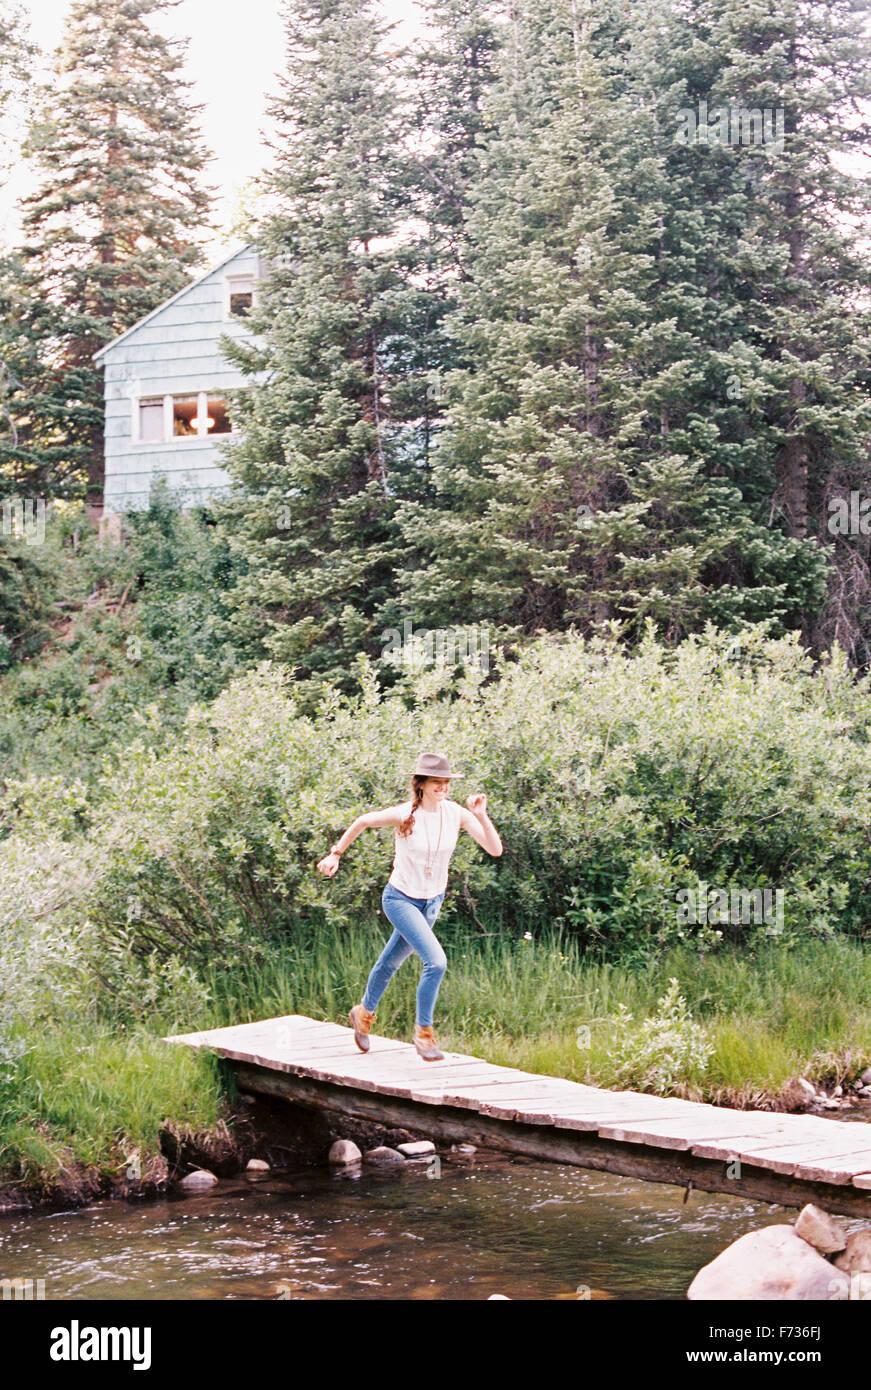 Woman running across a wooden bridge over a stream. - Stock Image